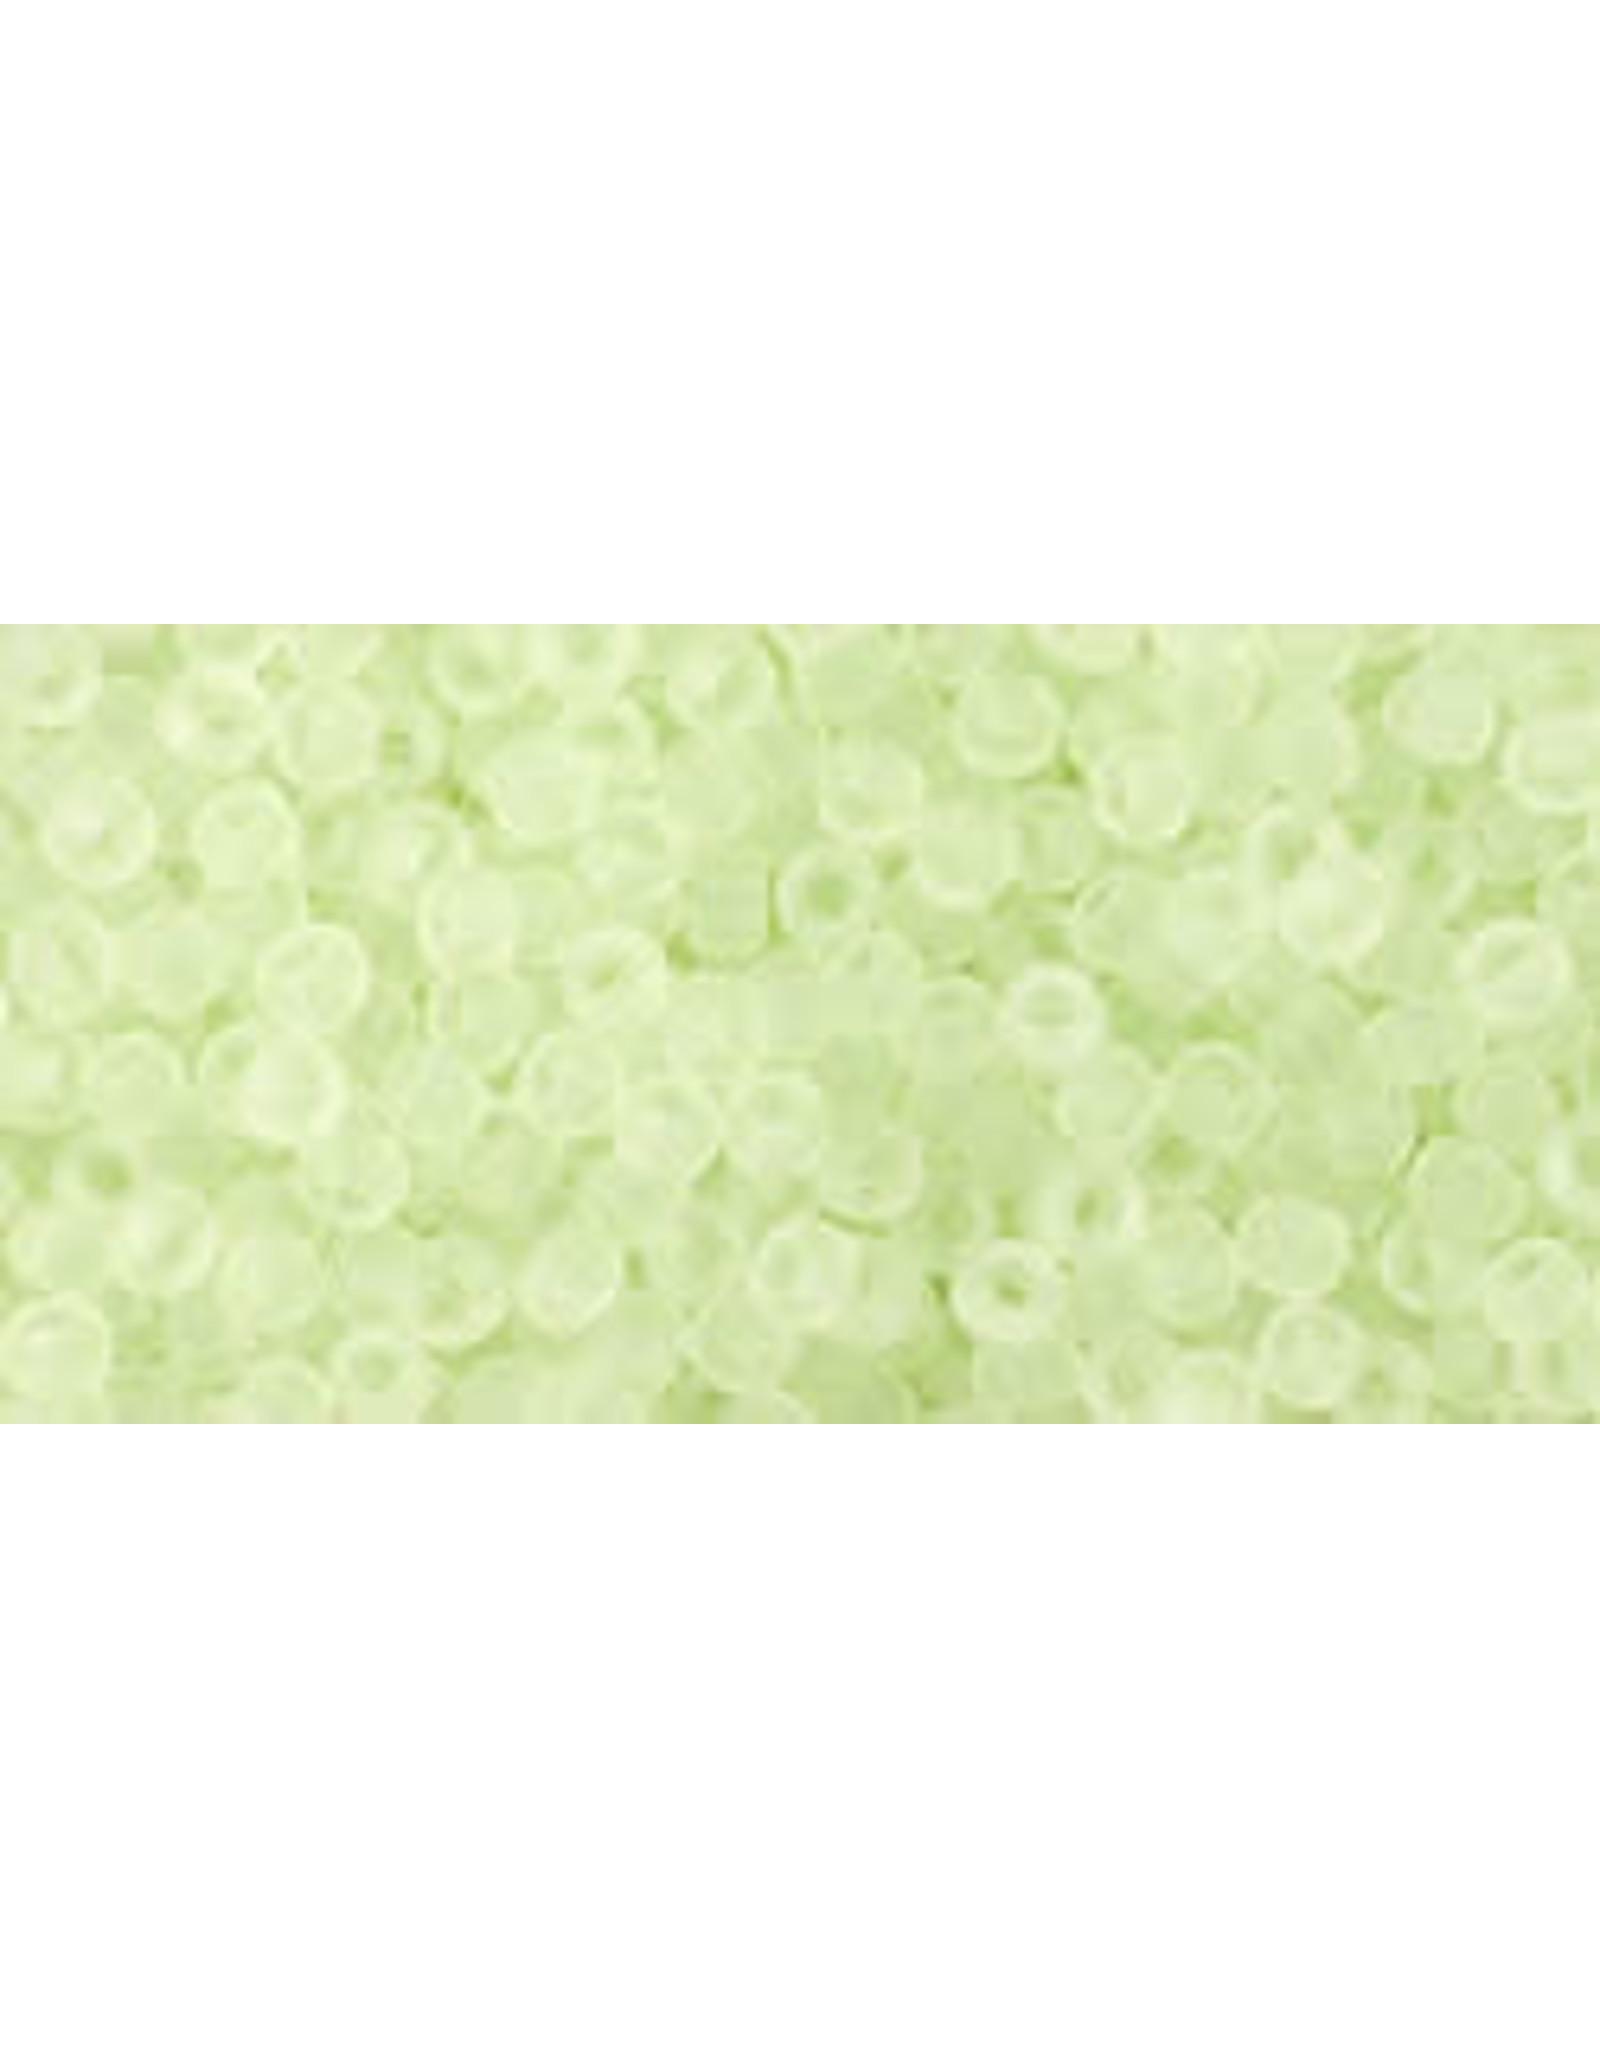 Toho 15f 11  Round 6g Citrus Spritz Green